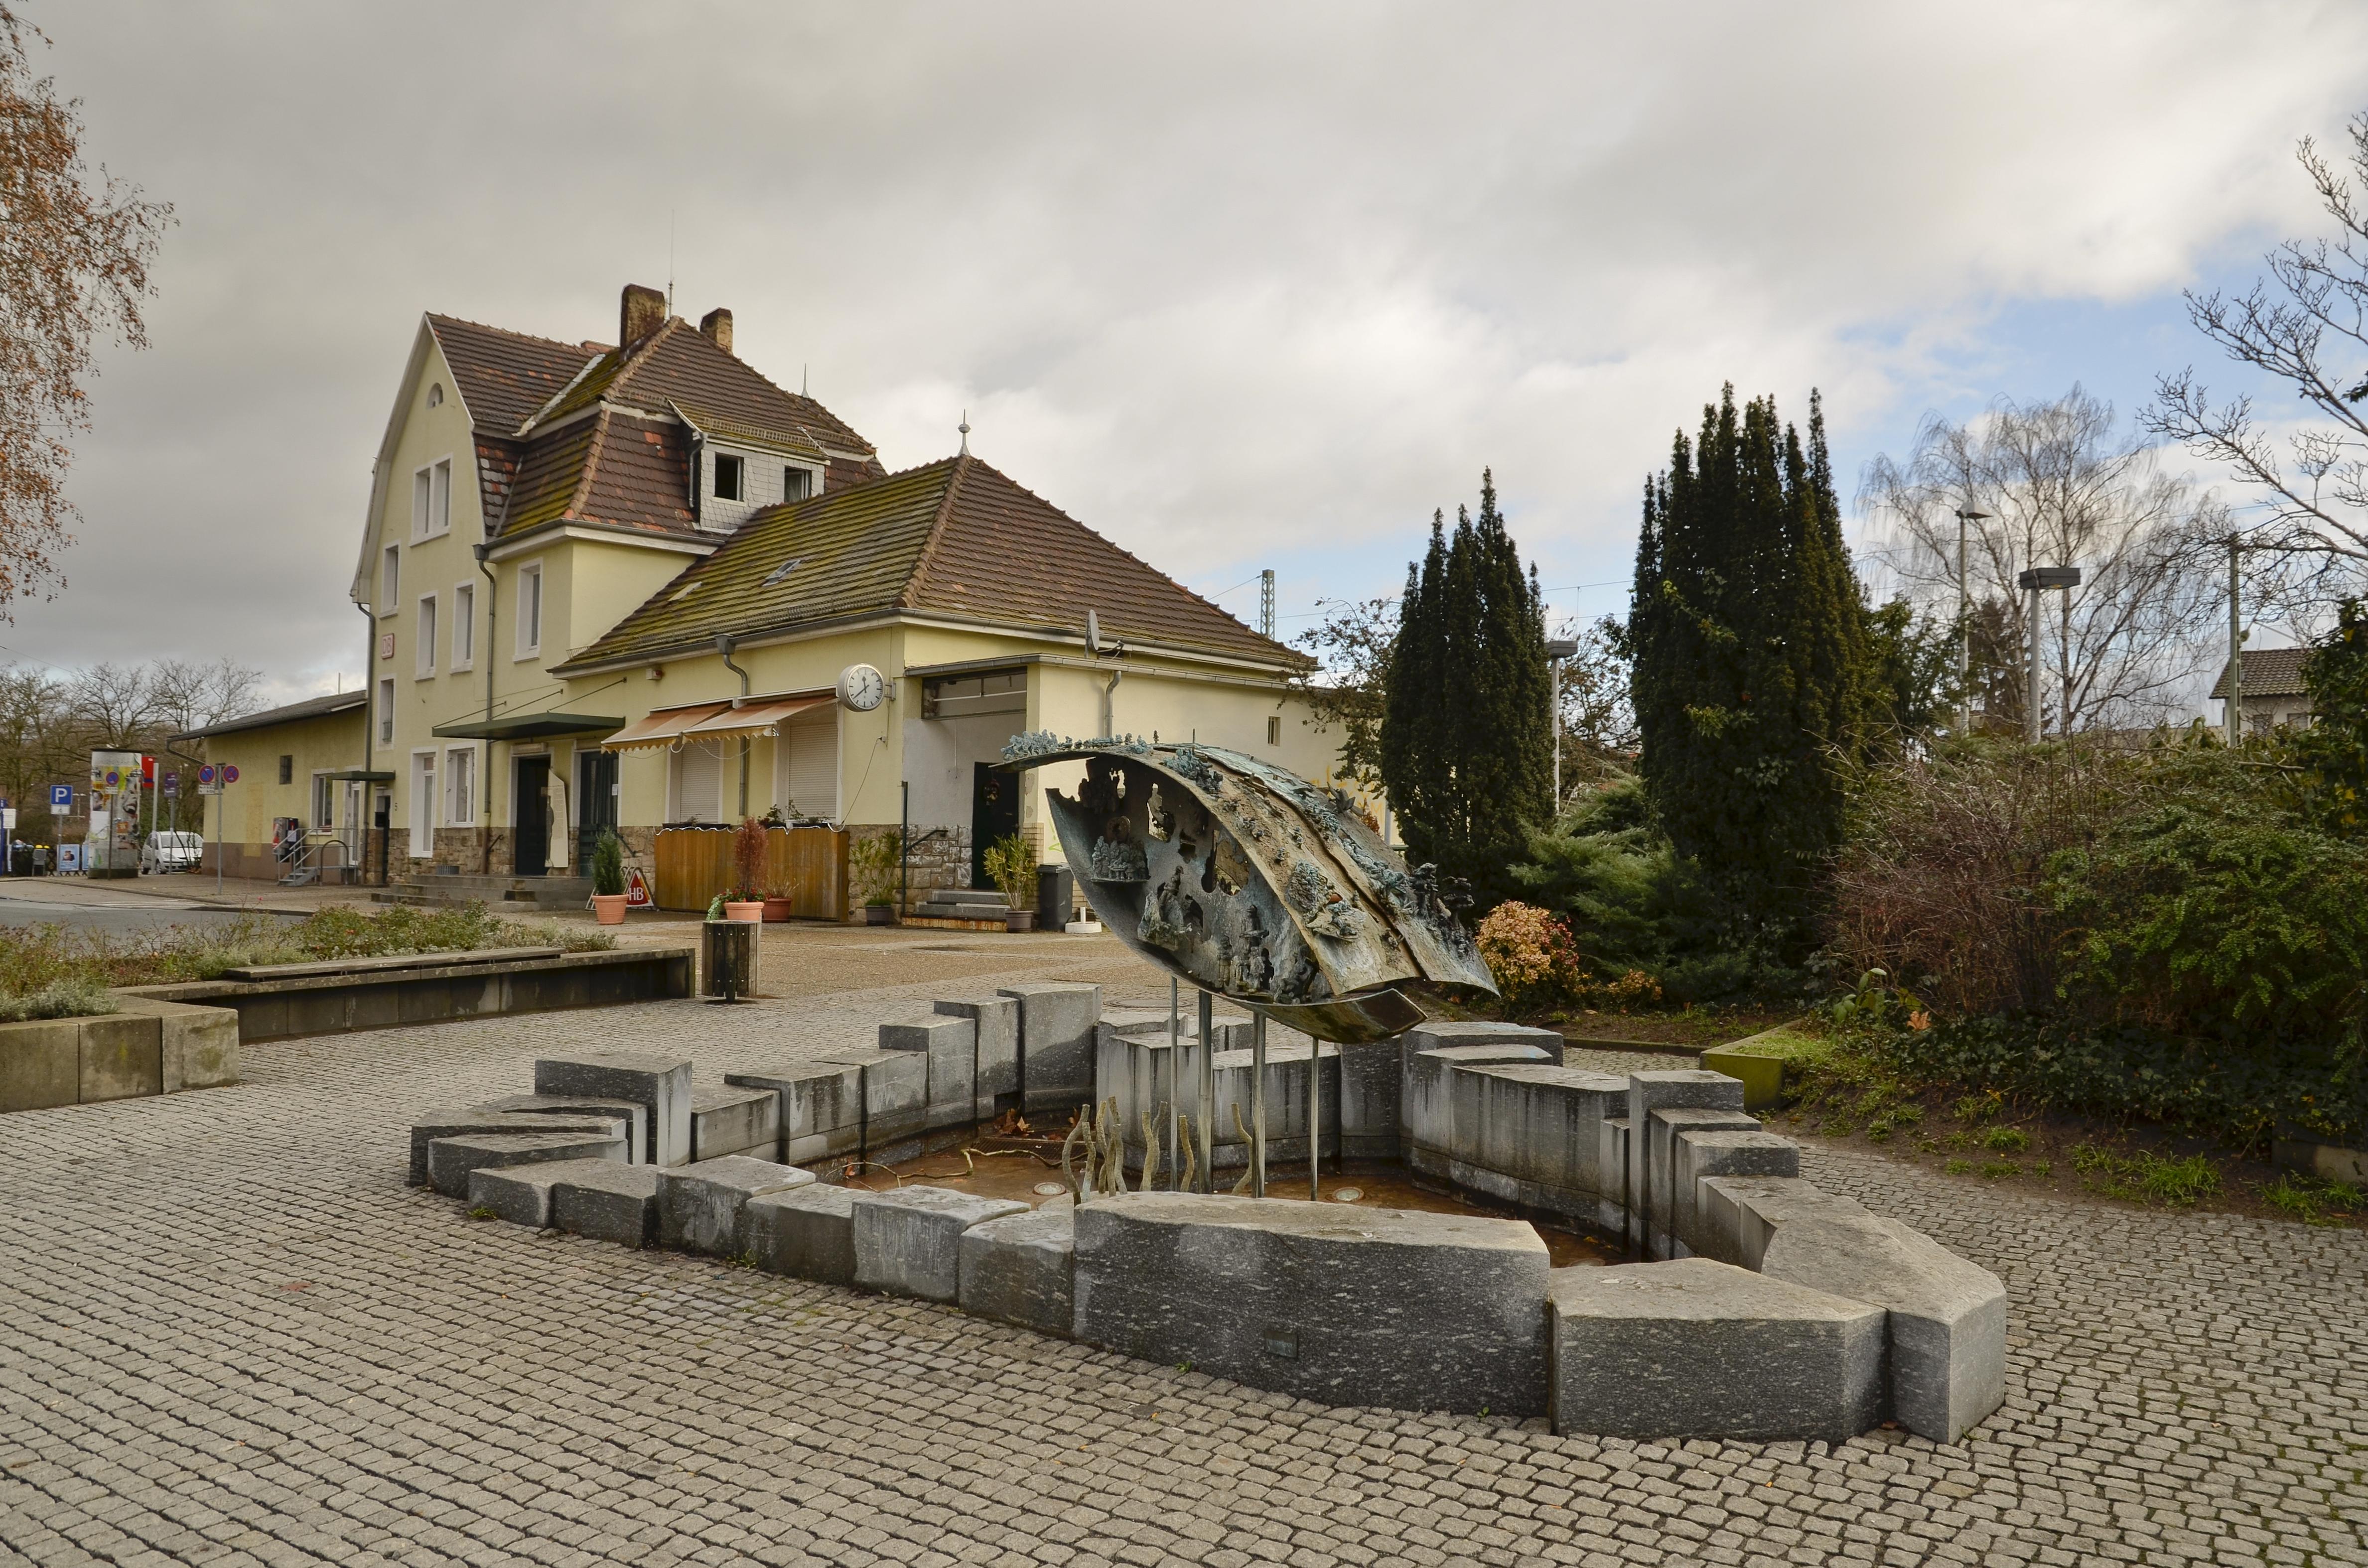 Morfelden-Walldorf Germany  City pictures : Bahnhof Walldorf Mörfelden Walldorf 01 Wikimedia ...